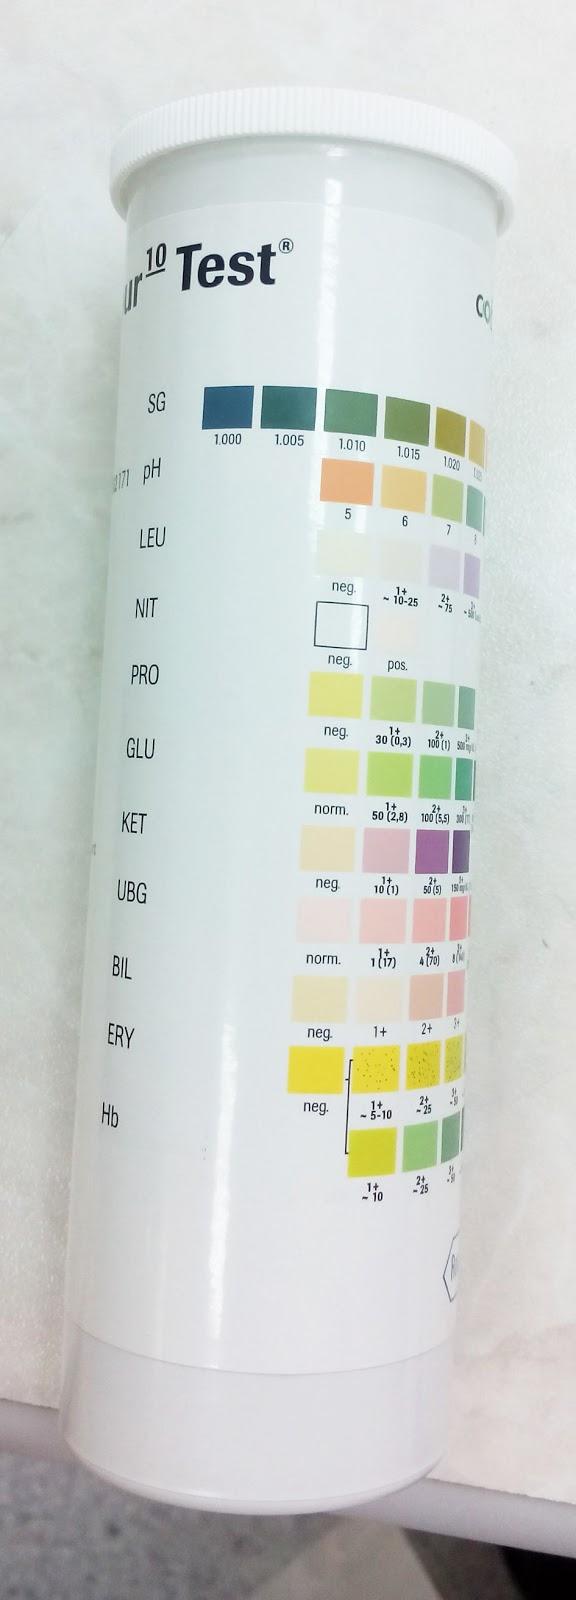 leukocyter och protein i urin